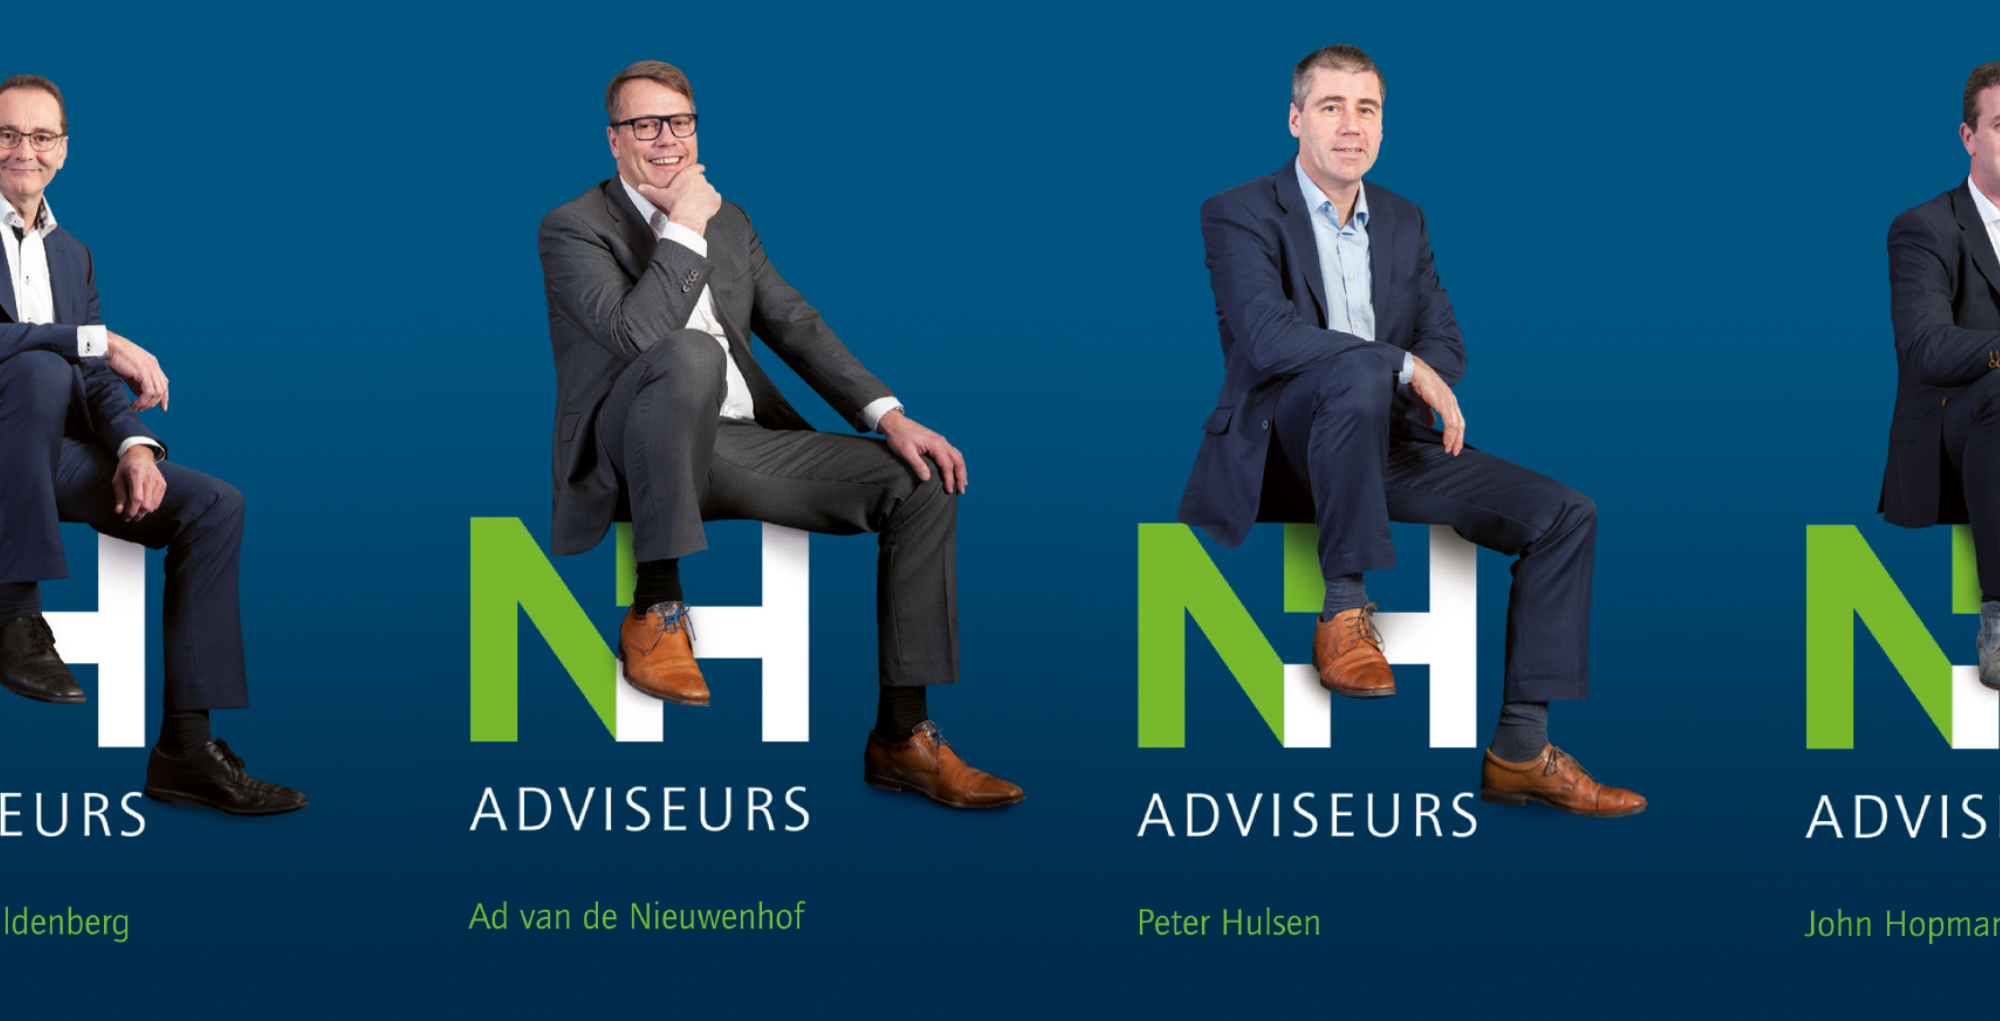 NH adviseurs logo